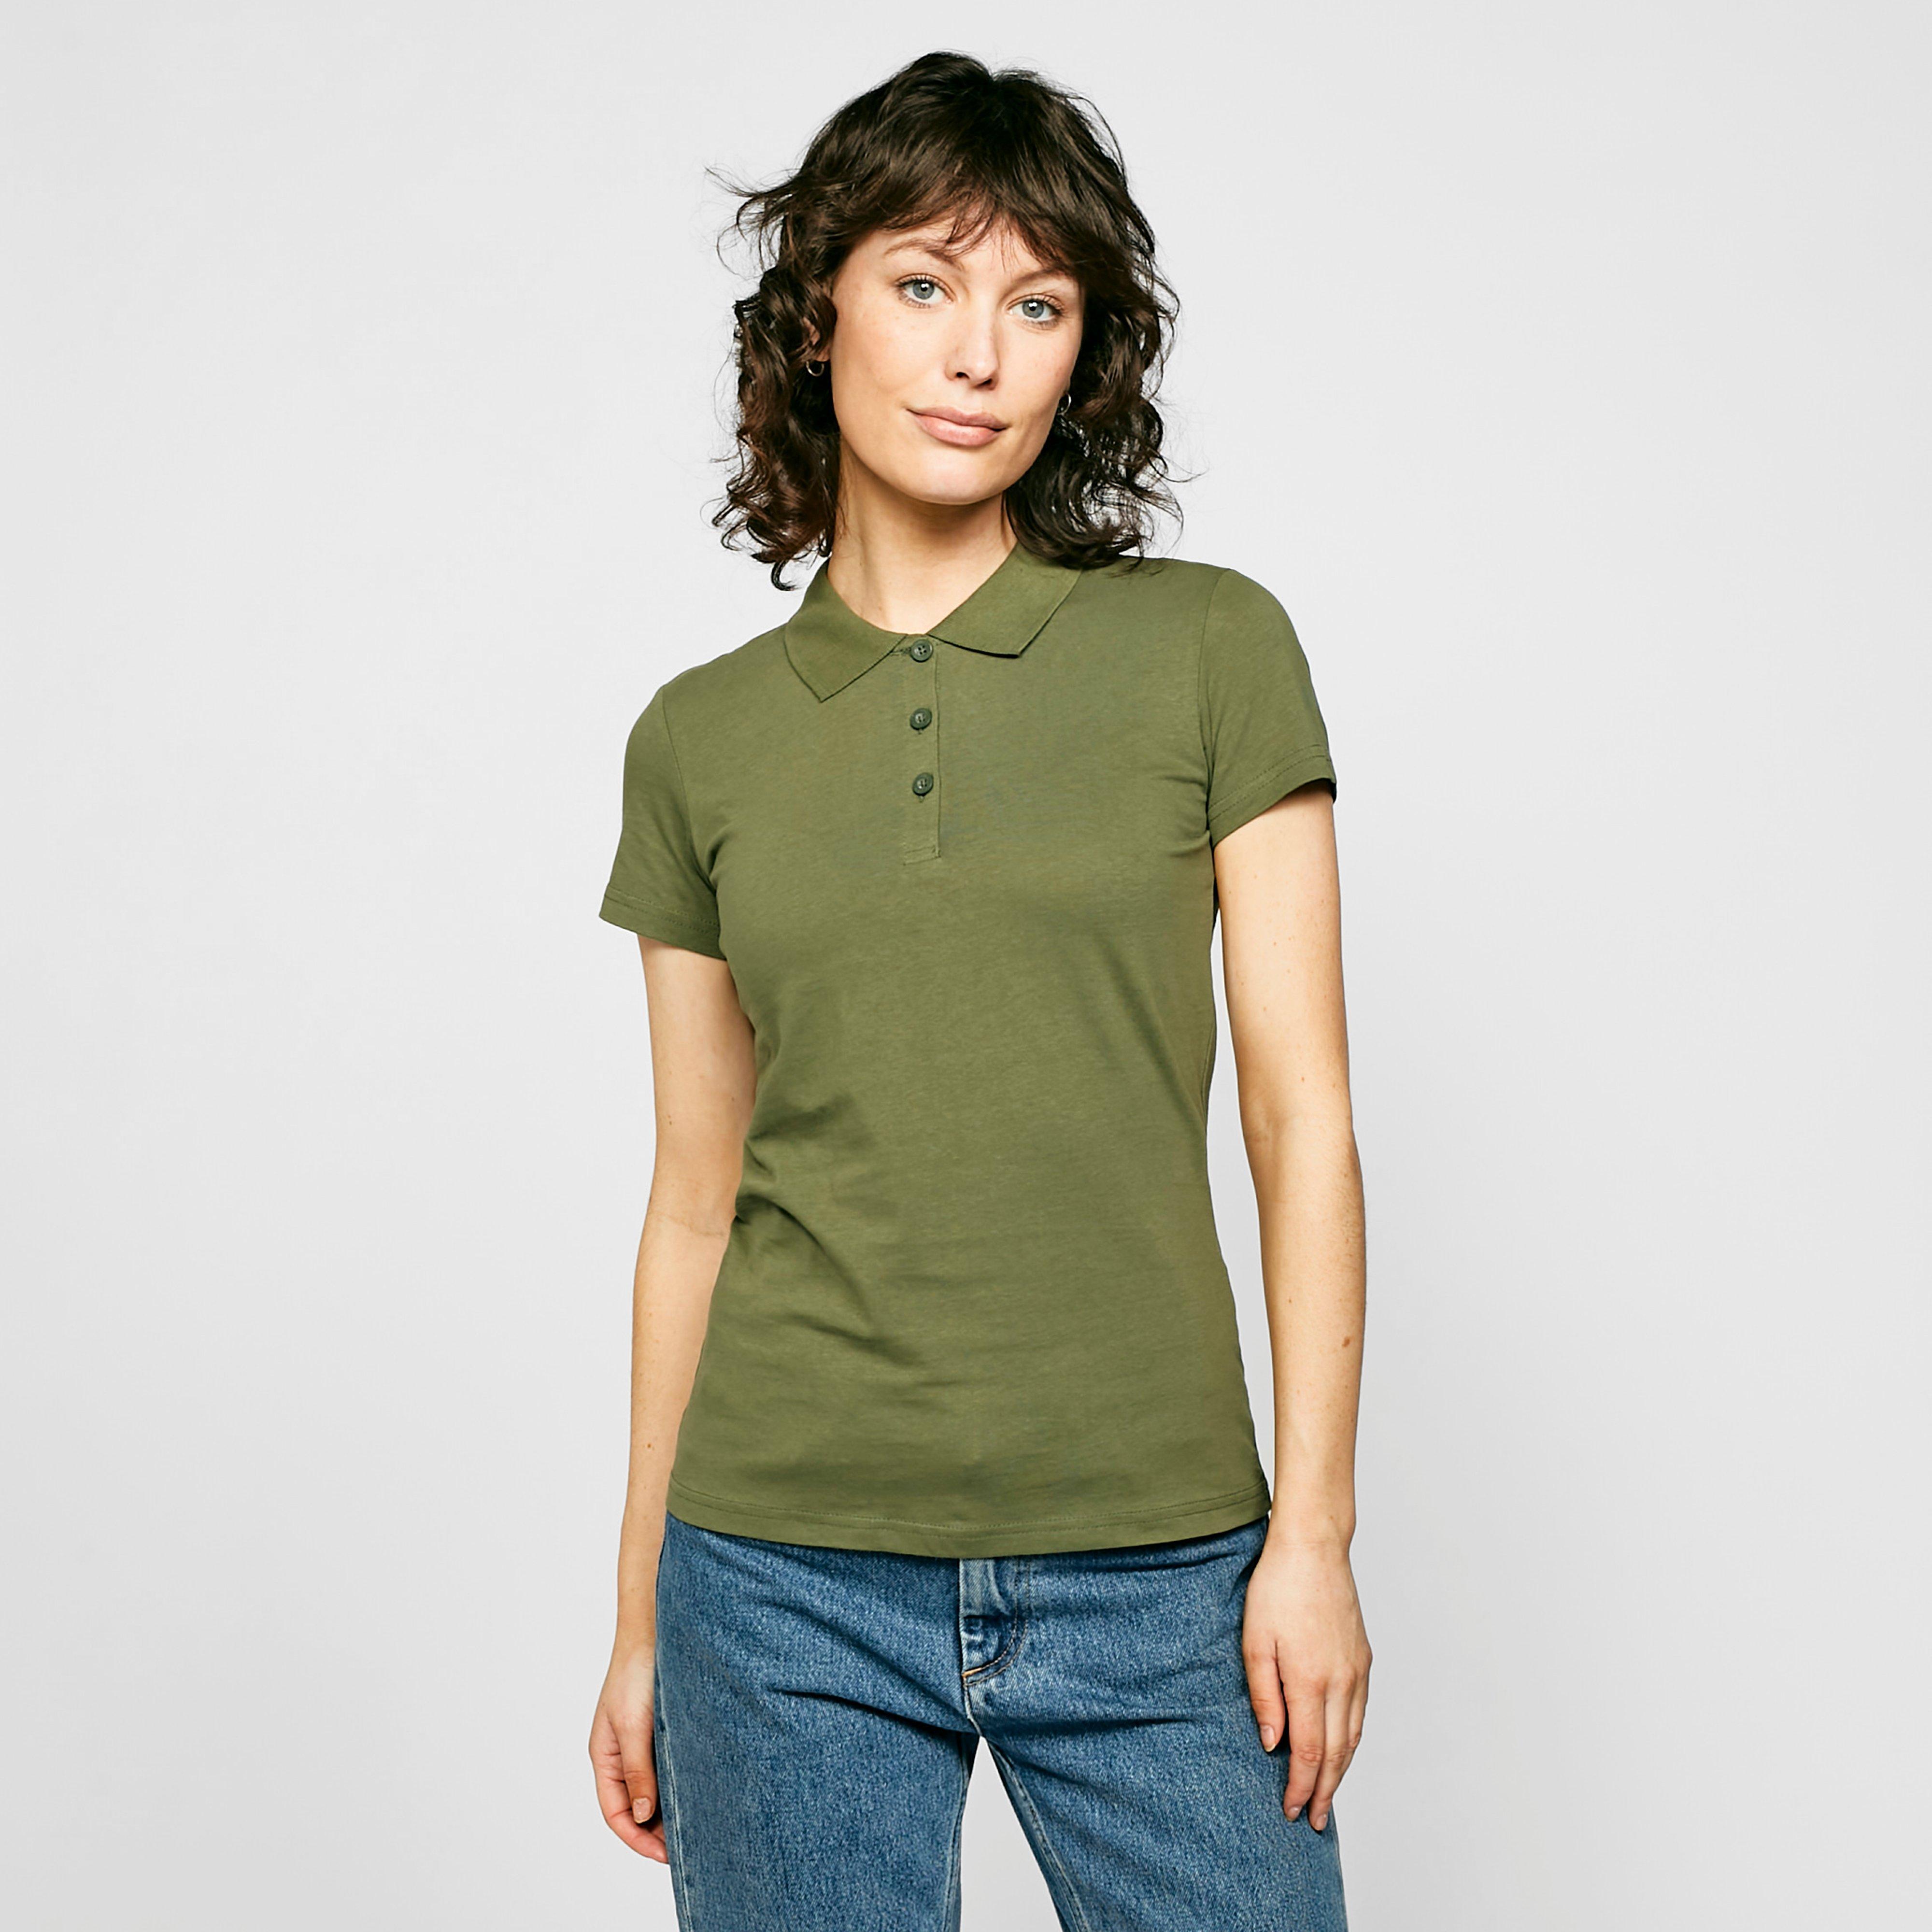 Regatta Womens Sintons Polo Shirt - Khaki/khk  Khaki/khk